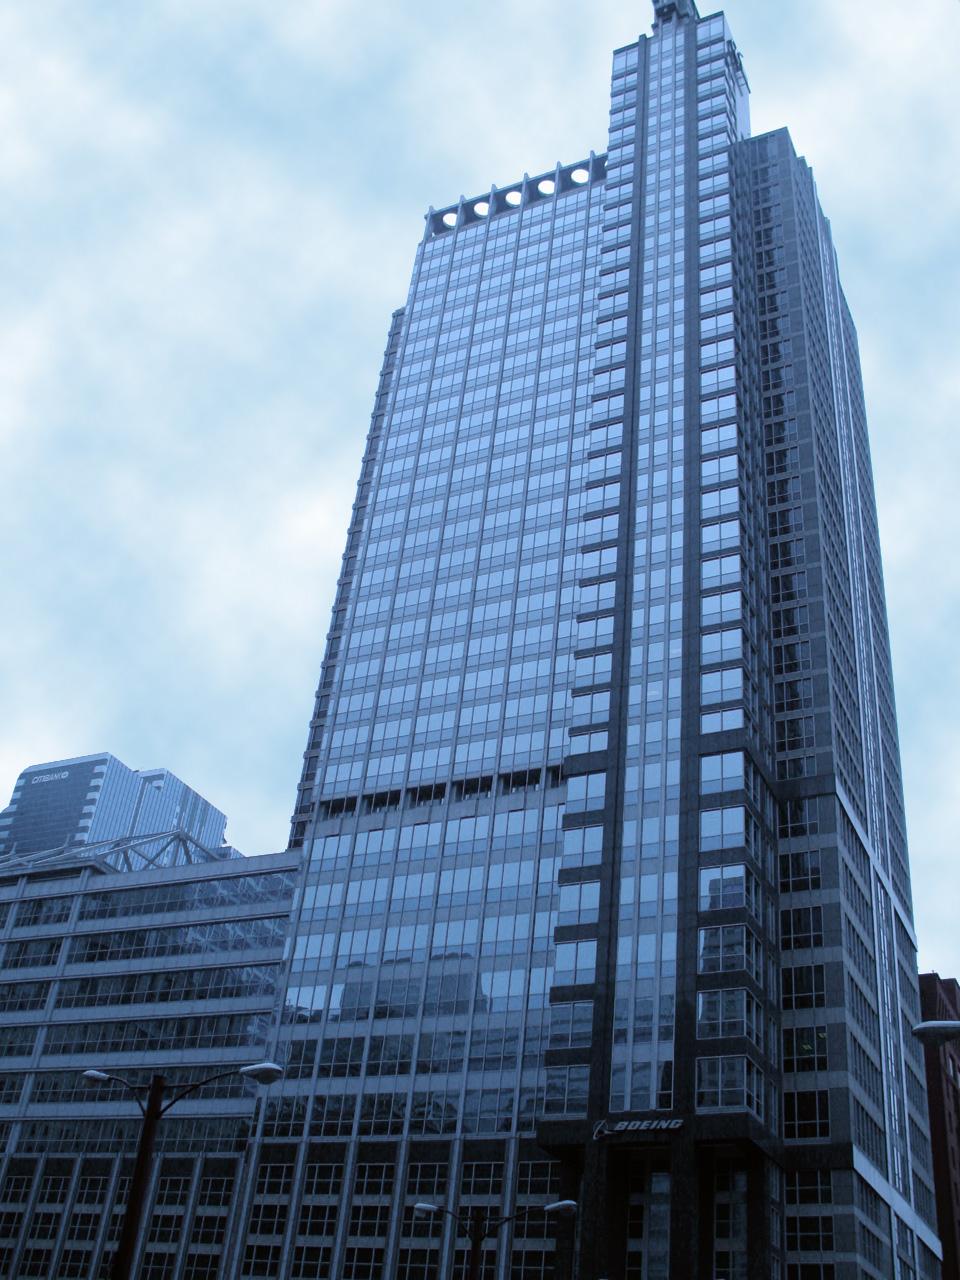 Boeing International Headquarters in Chicago. (Wikimedia)